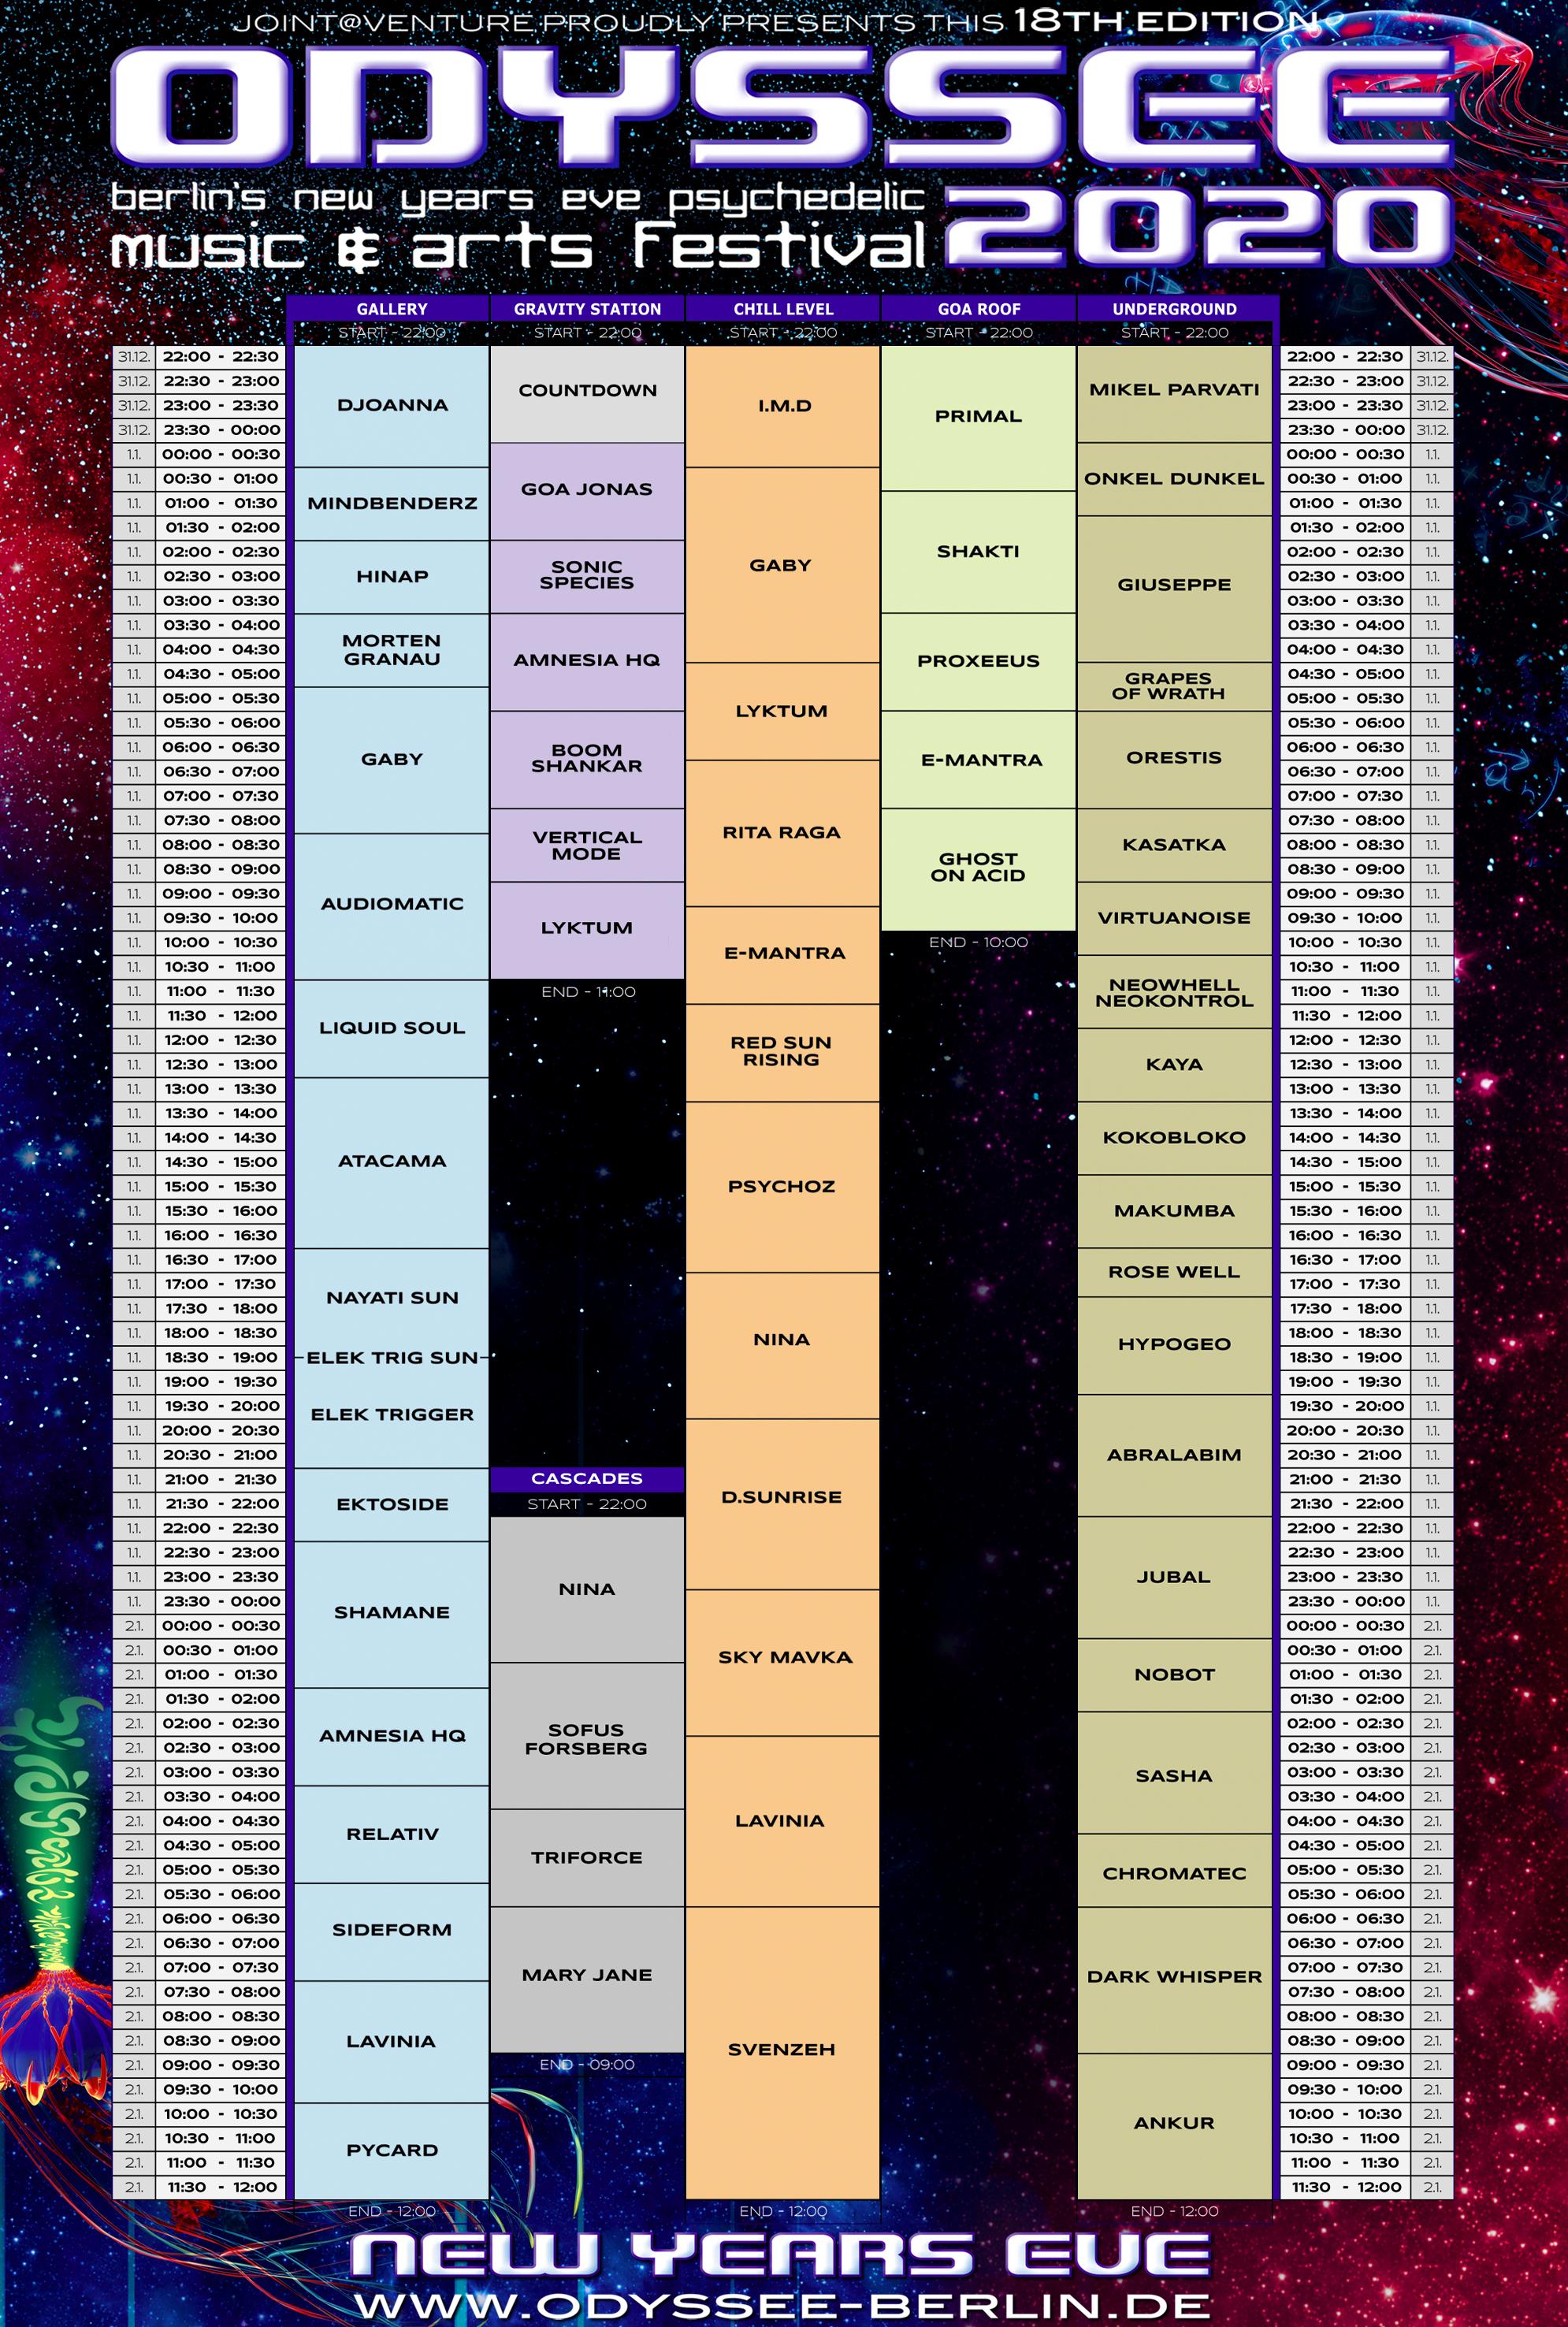 Odyssee 2020 Timetable BIG